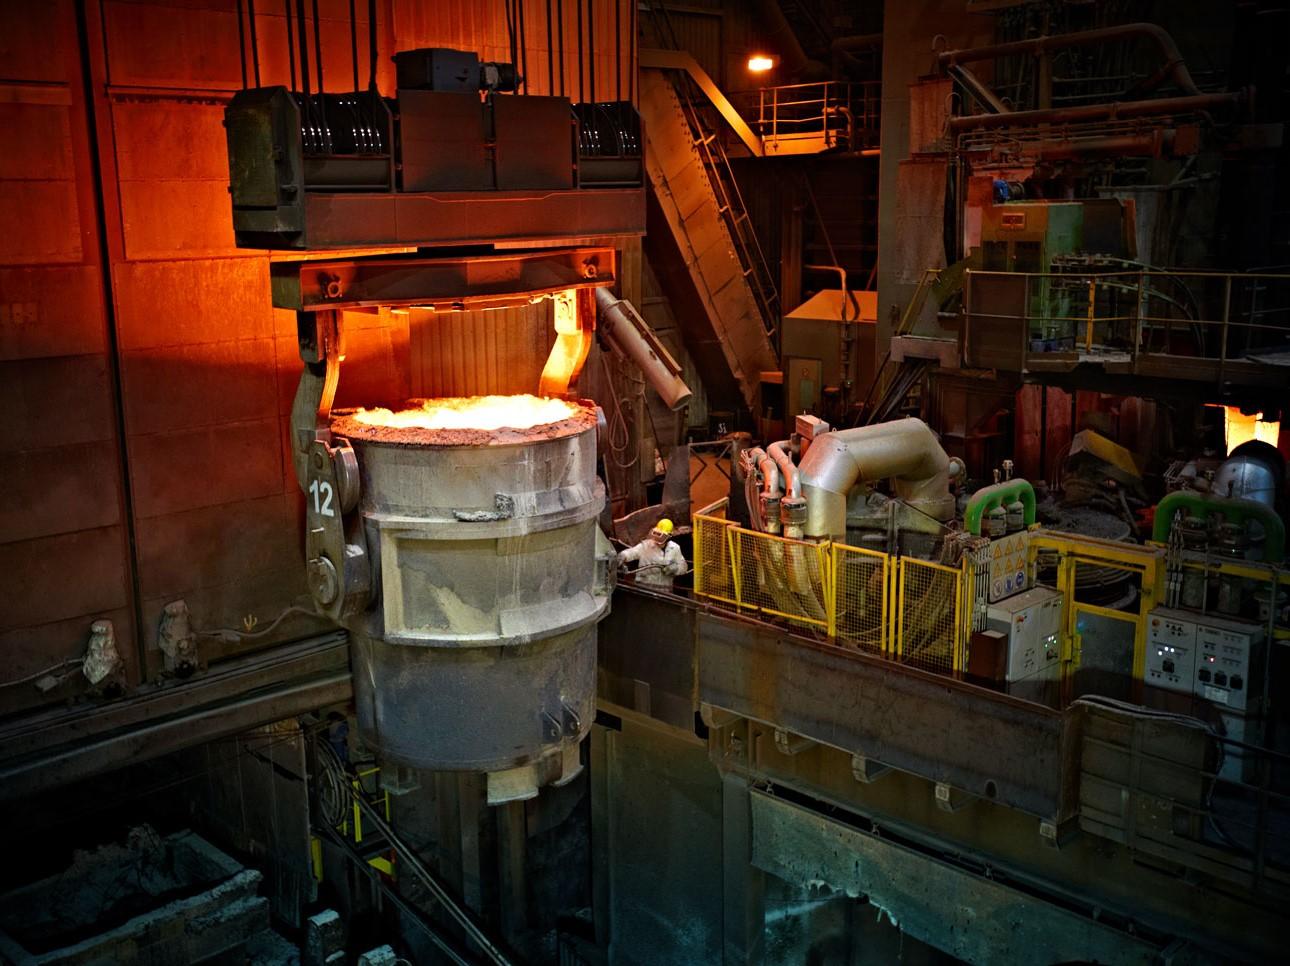 BENTELER Steel/Tube International-Werk in Lingen (Ems).